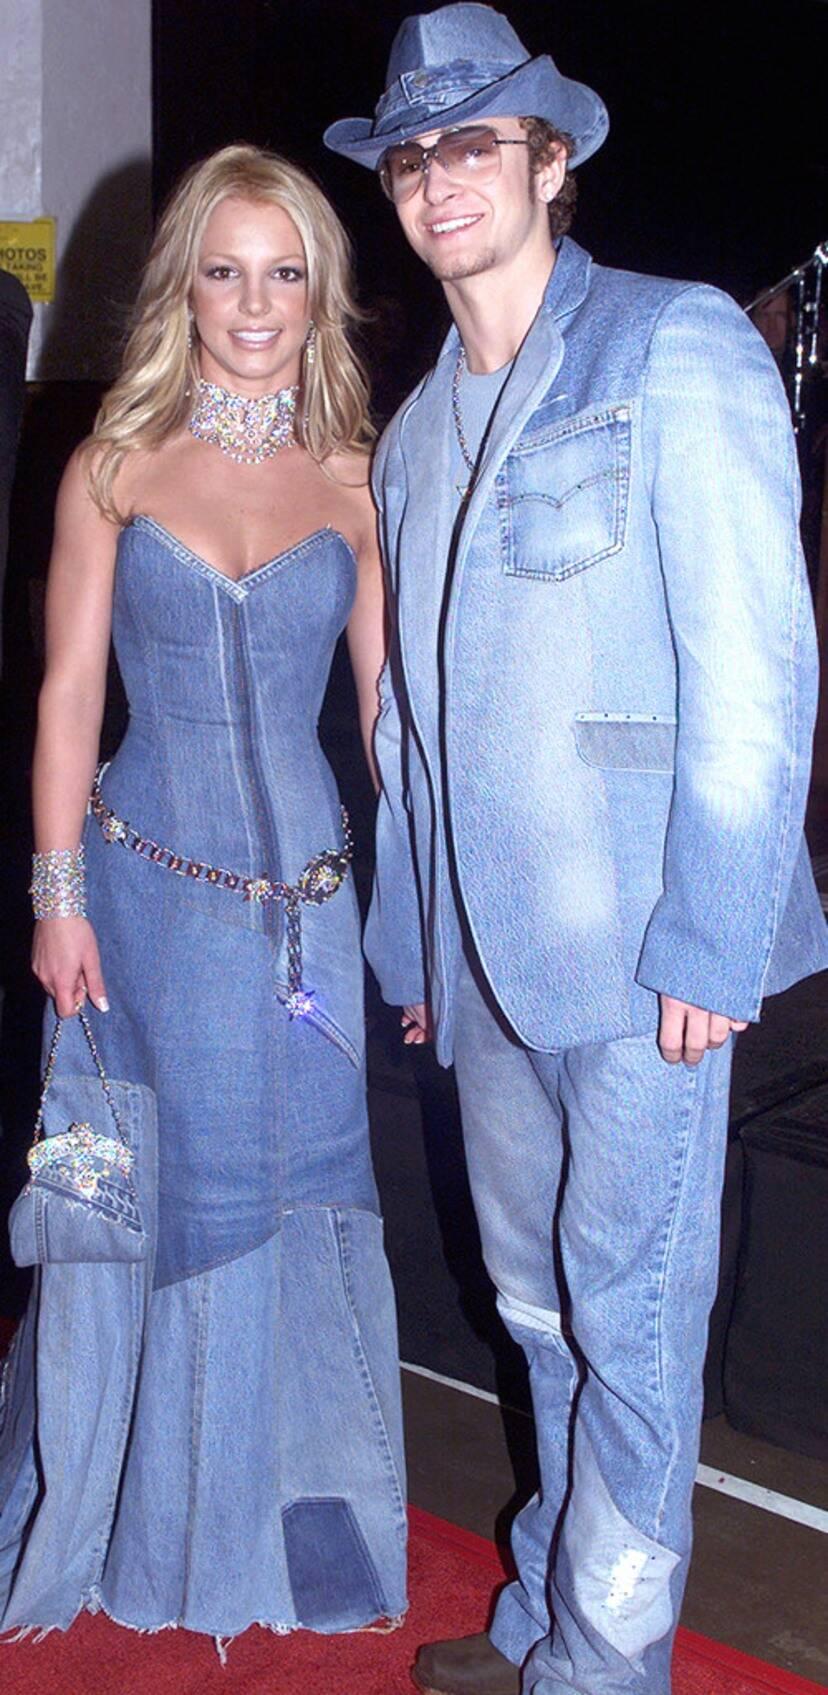 Britney Spears és Justin Timberlake